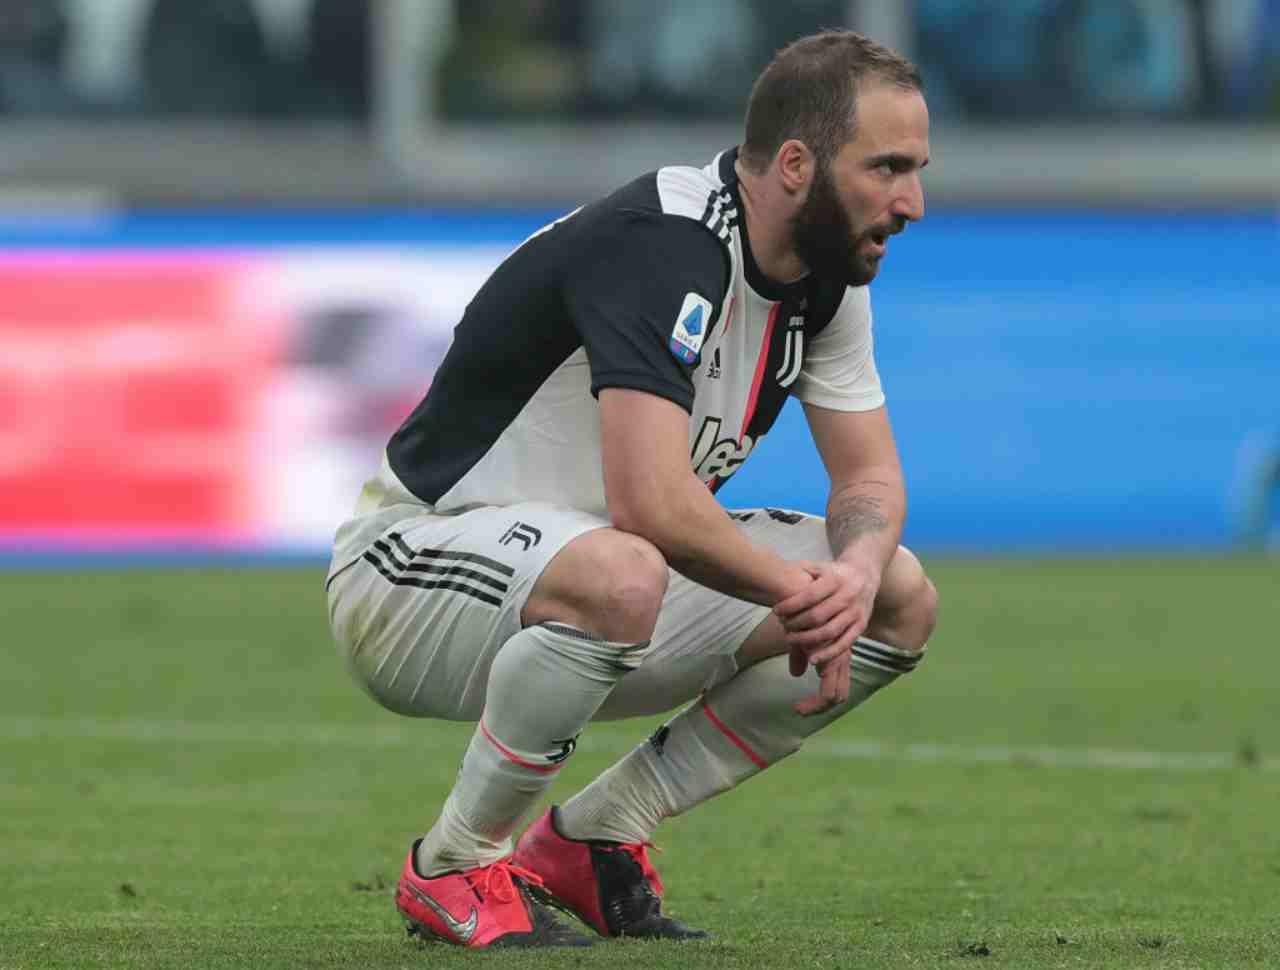 Higuain al River Plate, la Juve punta il talento dei Millionarios